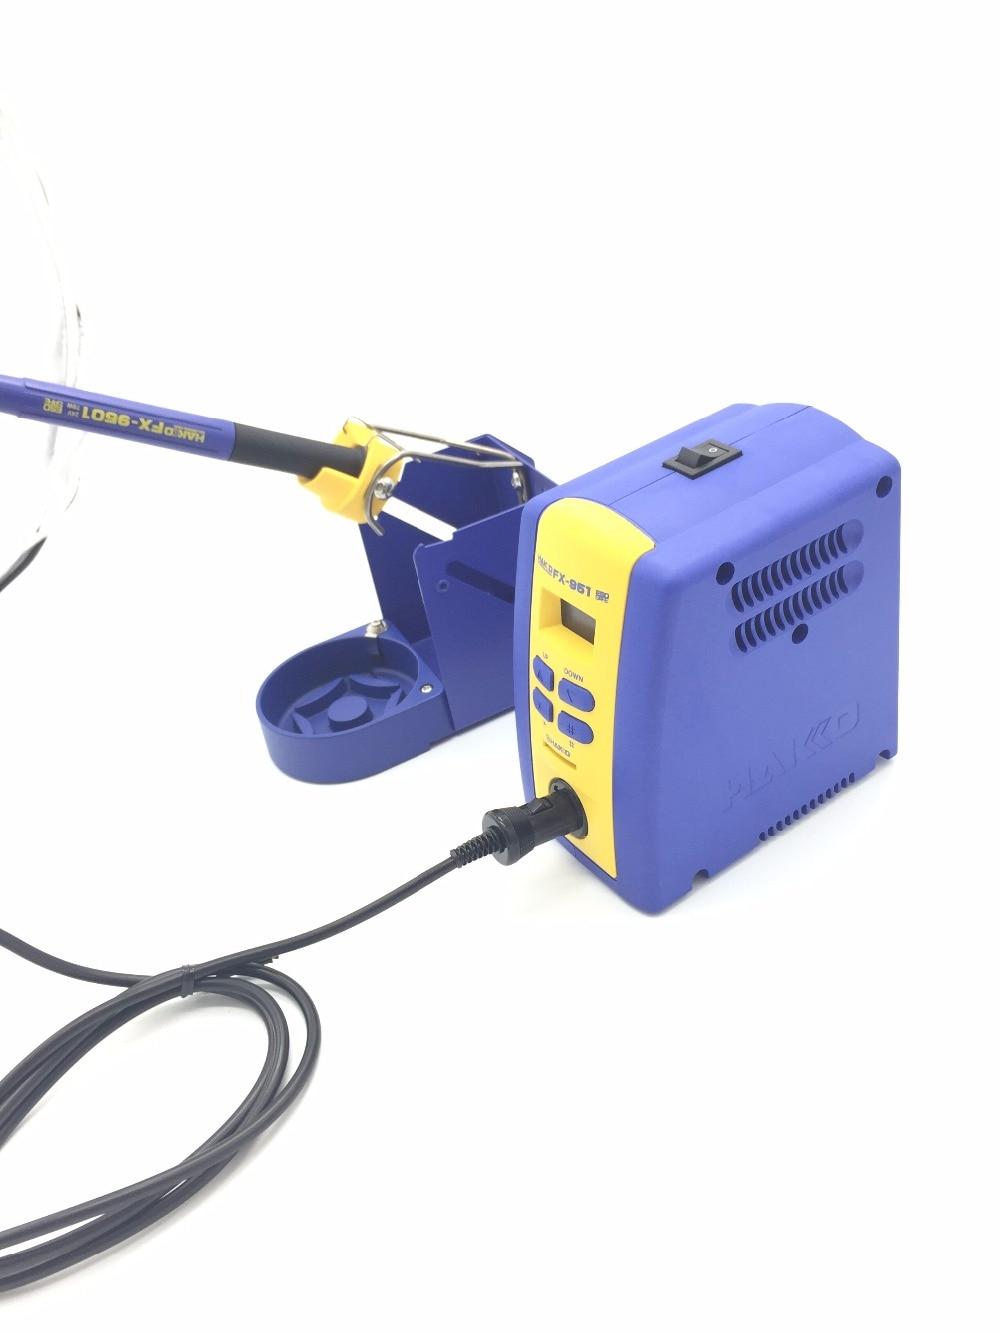 75W Genuine Hakko FX951 FX 951 soldering station with sleeping function FX9501 soldering Iron